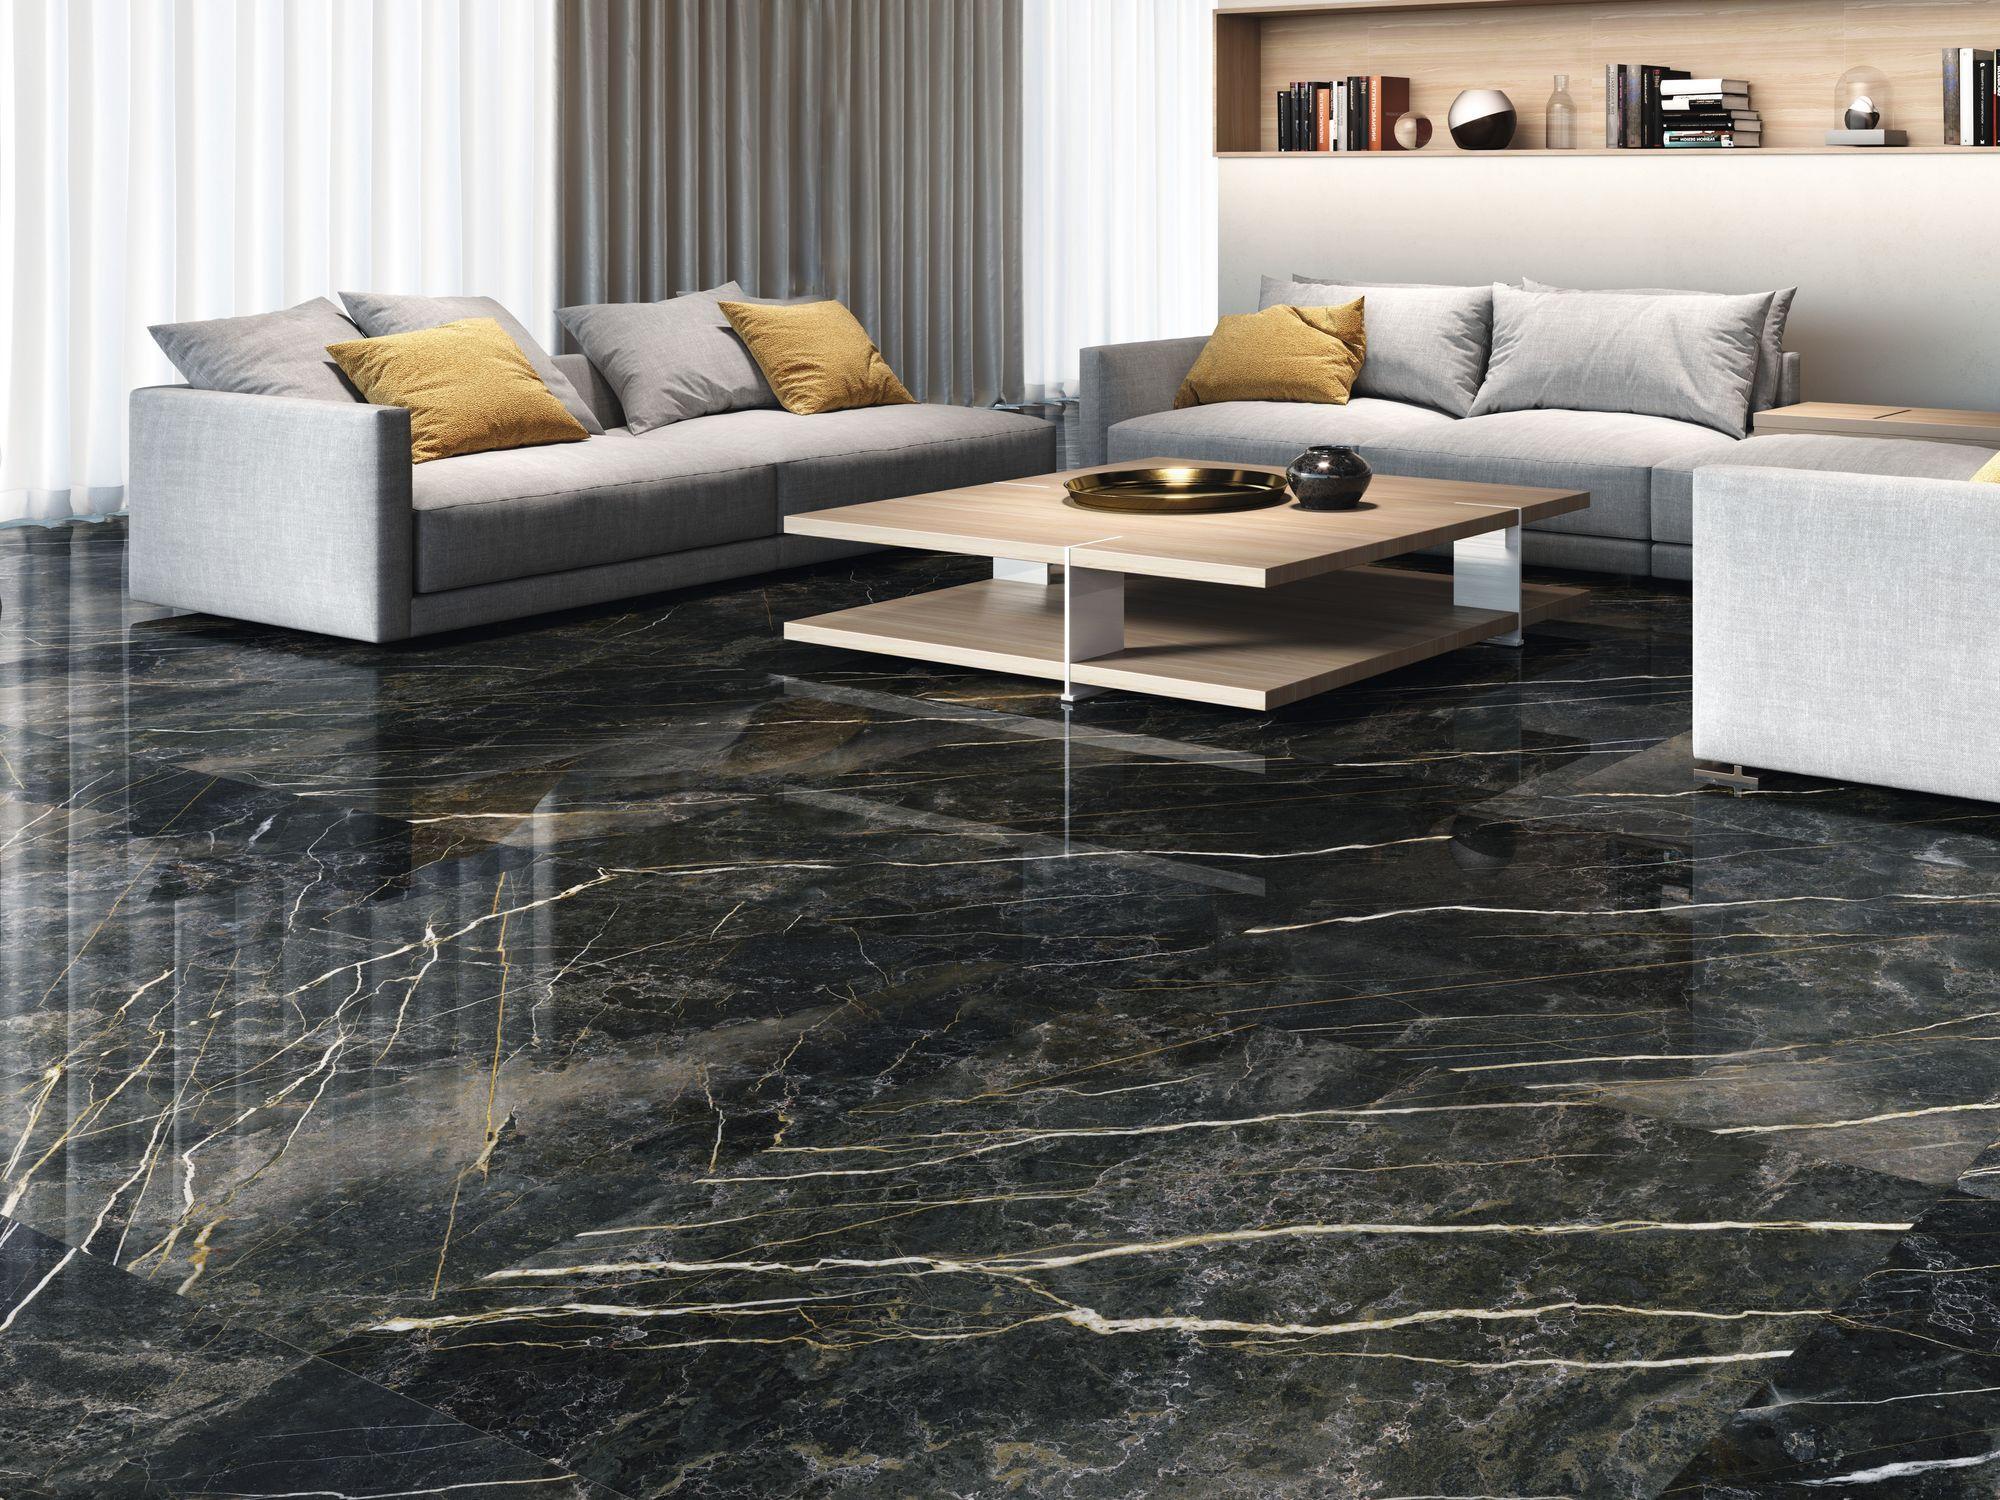 Carrelage effet marbre Quiberon